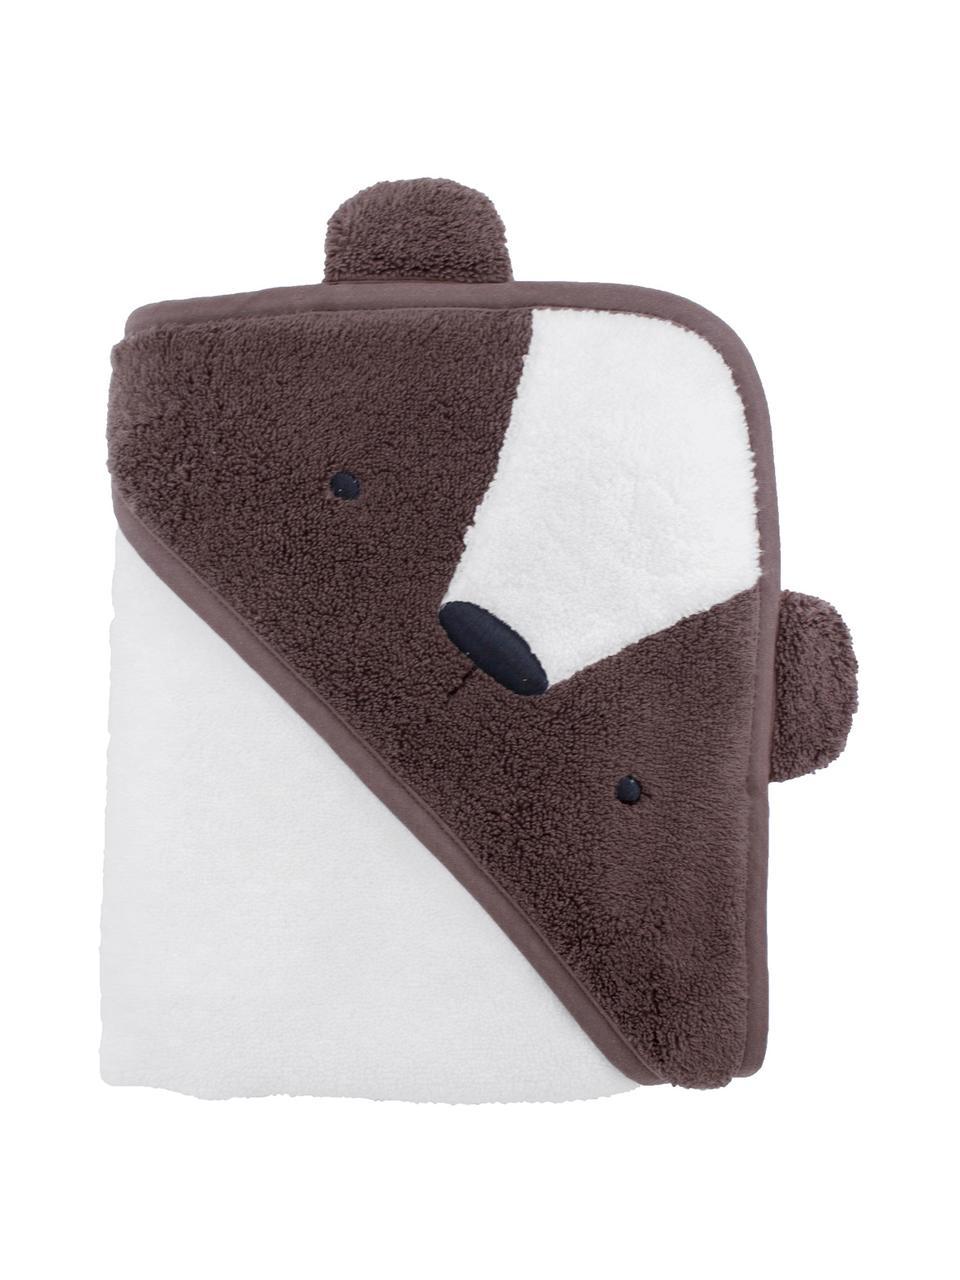 Asciugamano con cappuccio Bär, Cotone, Marrone, bianco, Larg. 85 x Lung. 85 cm